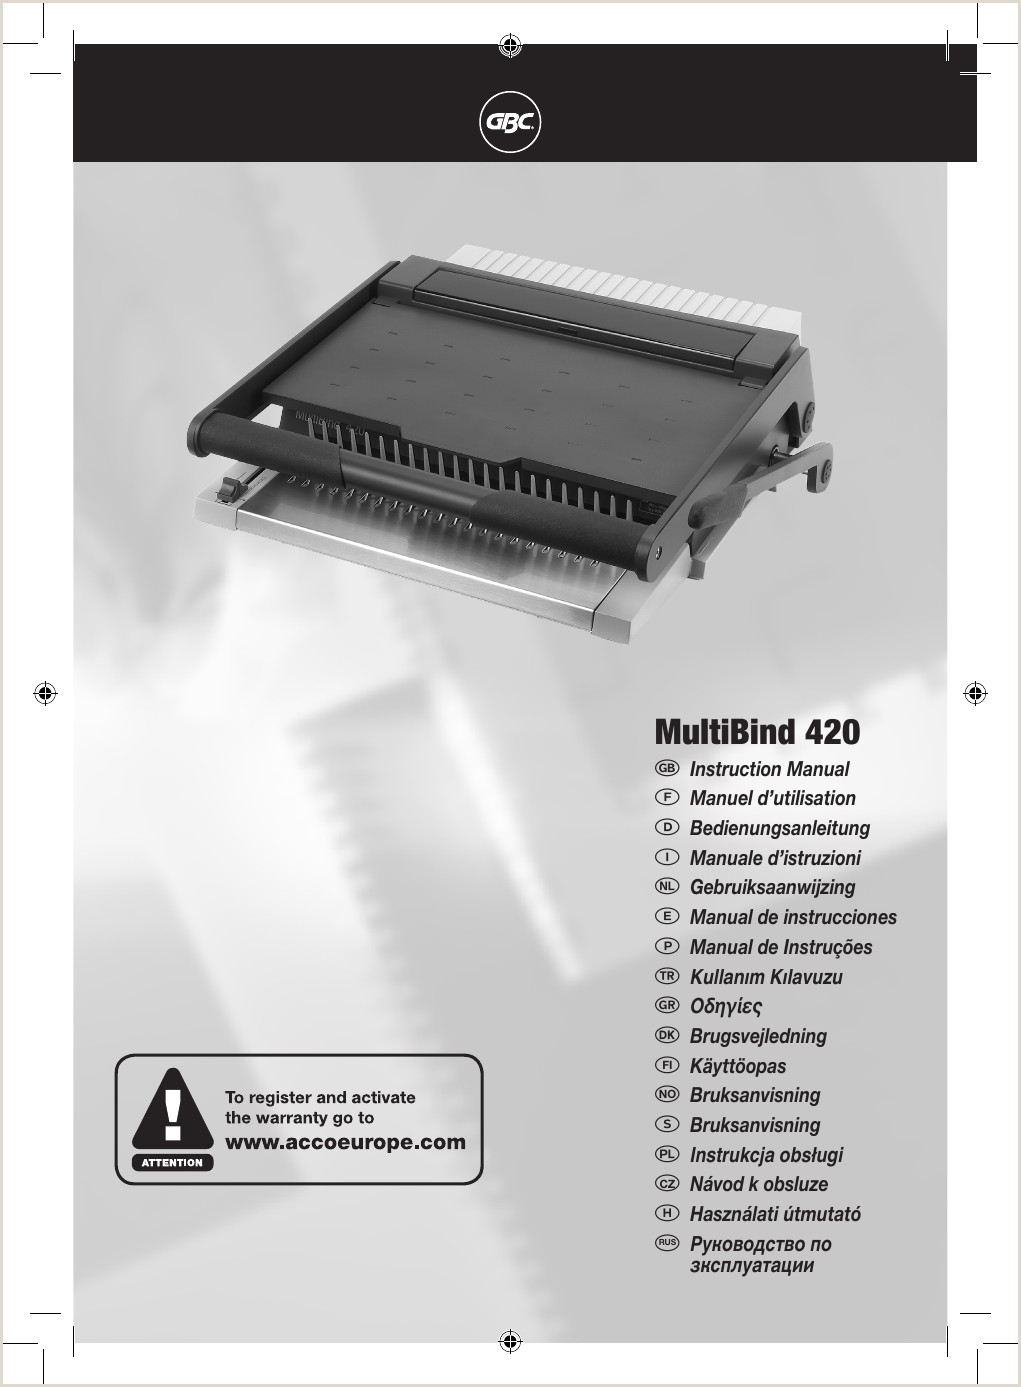 MultiBind 420